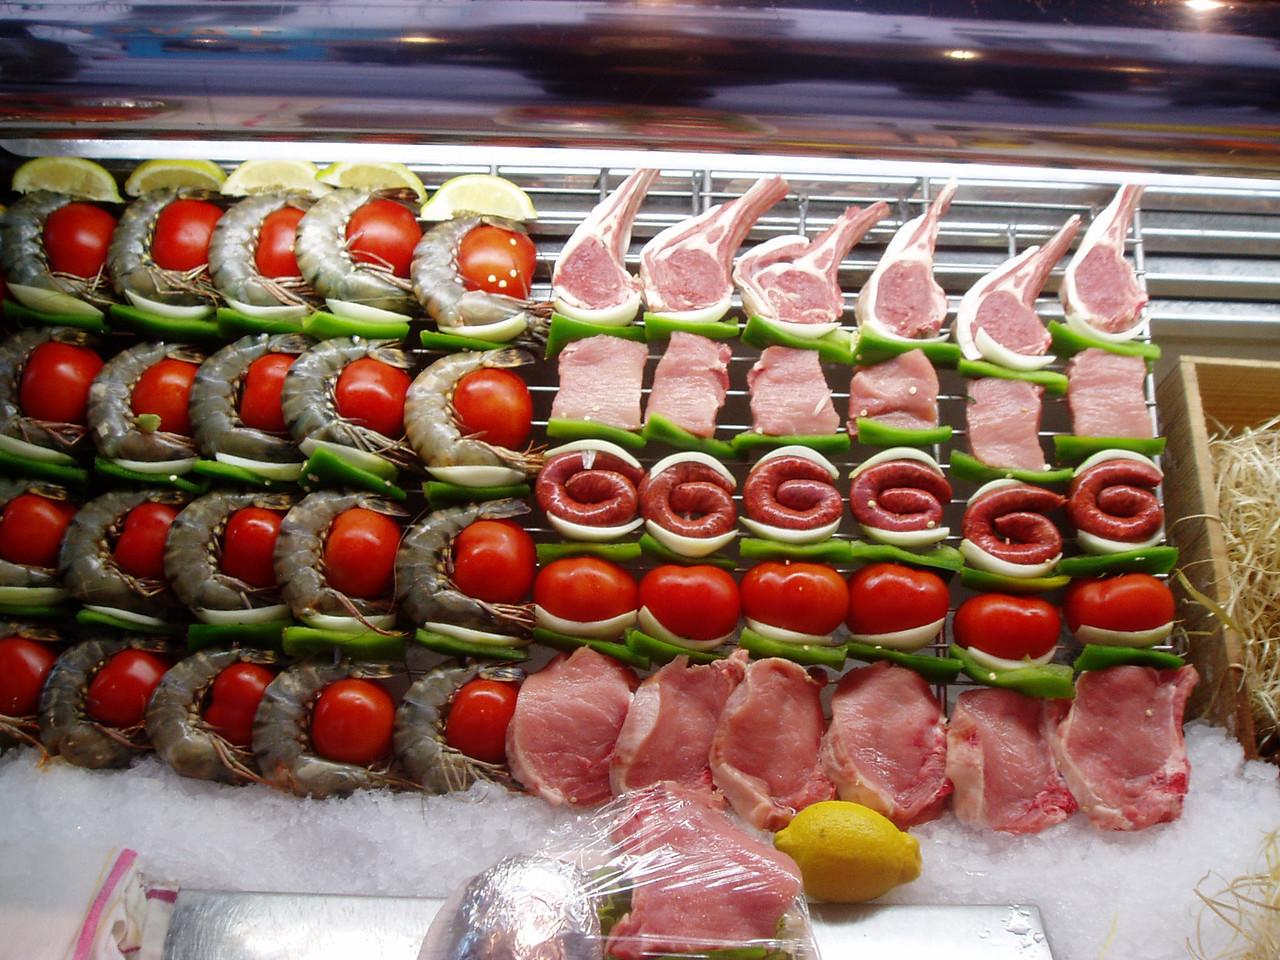 Foods being sold in Latin Quarter  Paris